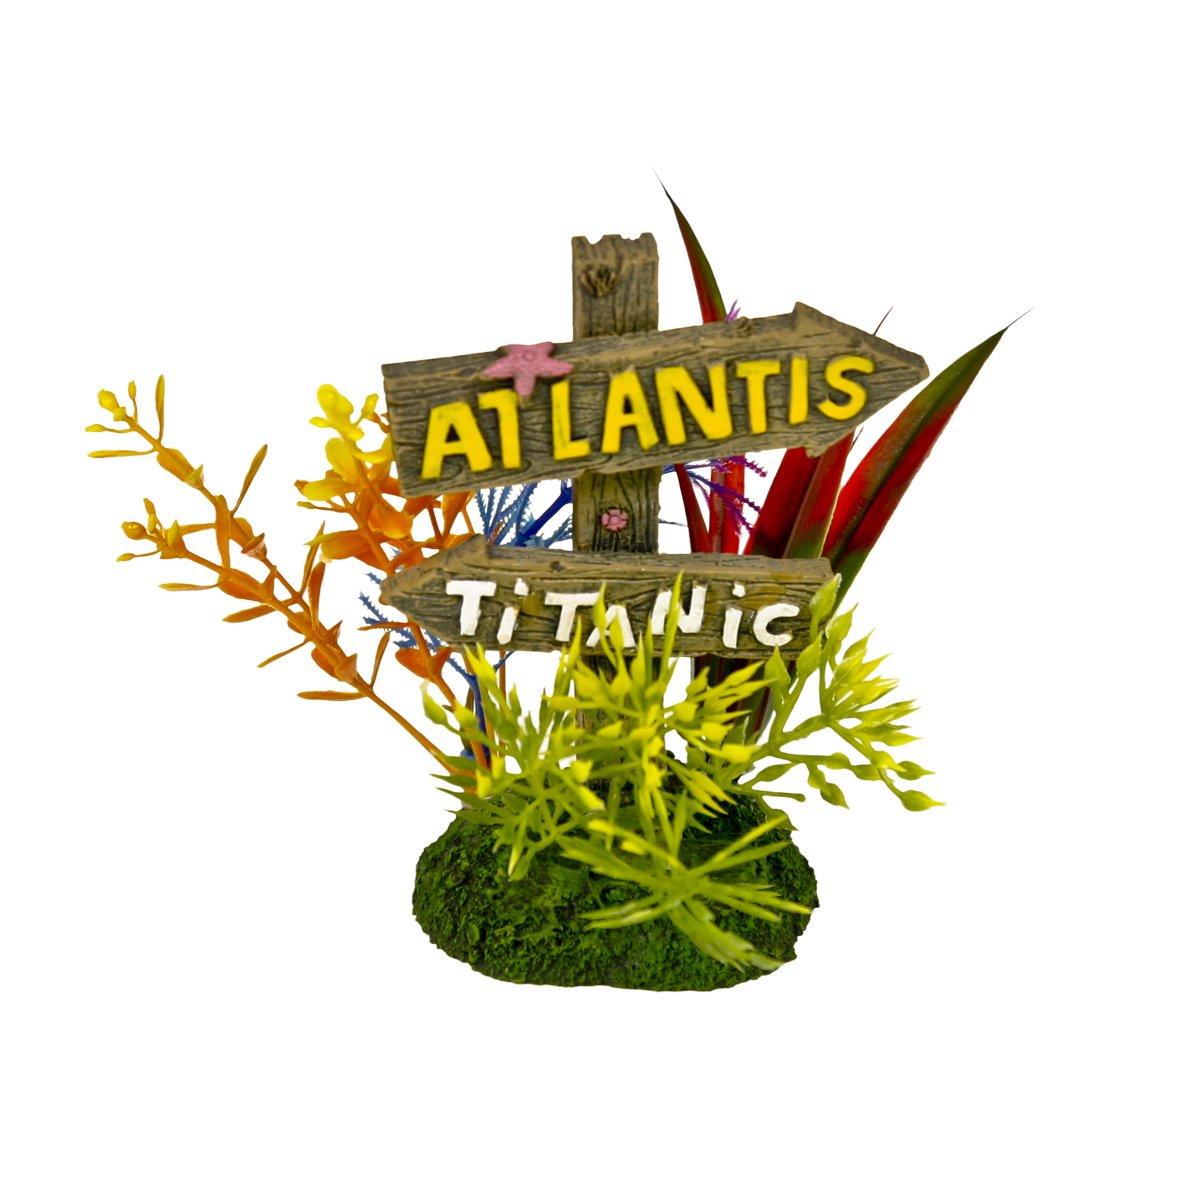 Blue Ribbon Pet Products 006083 Exotic Umgebungen Atlantis und Titanic Schild Dealfisher EE-1140